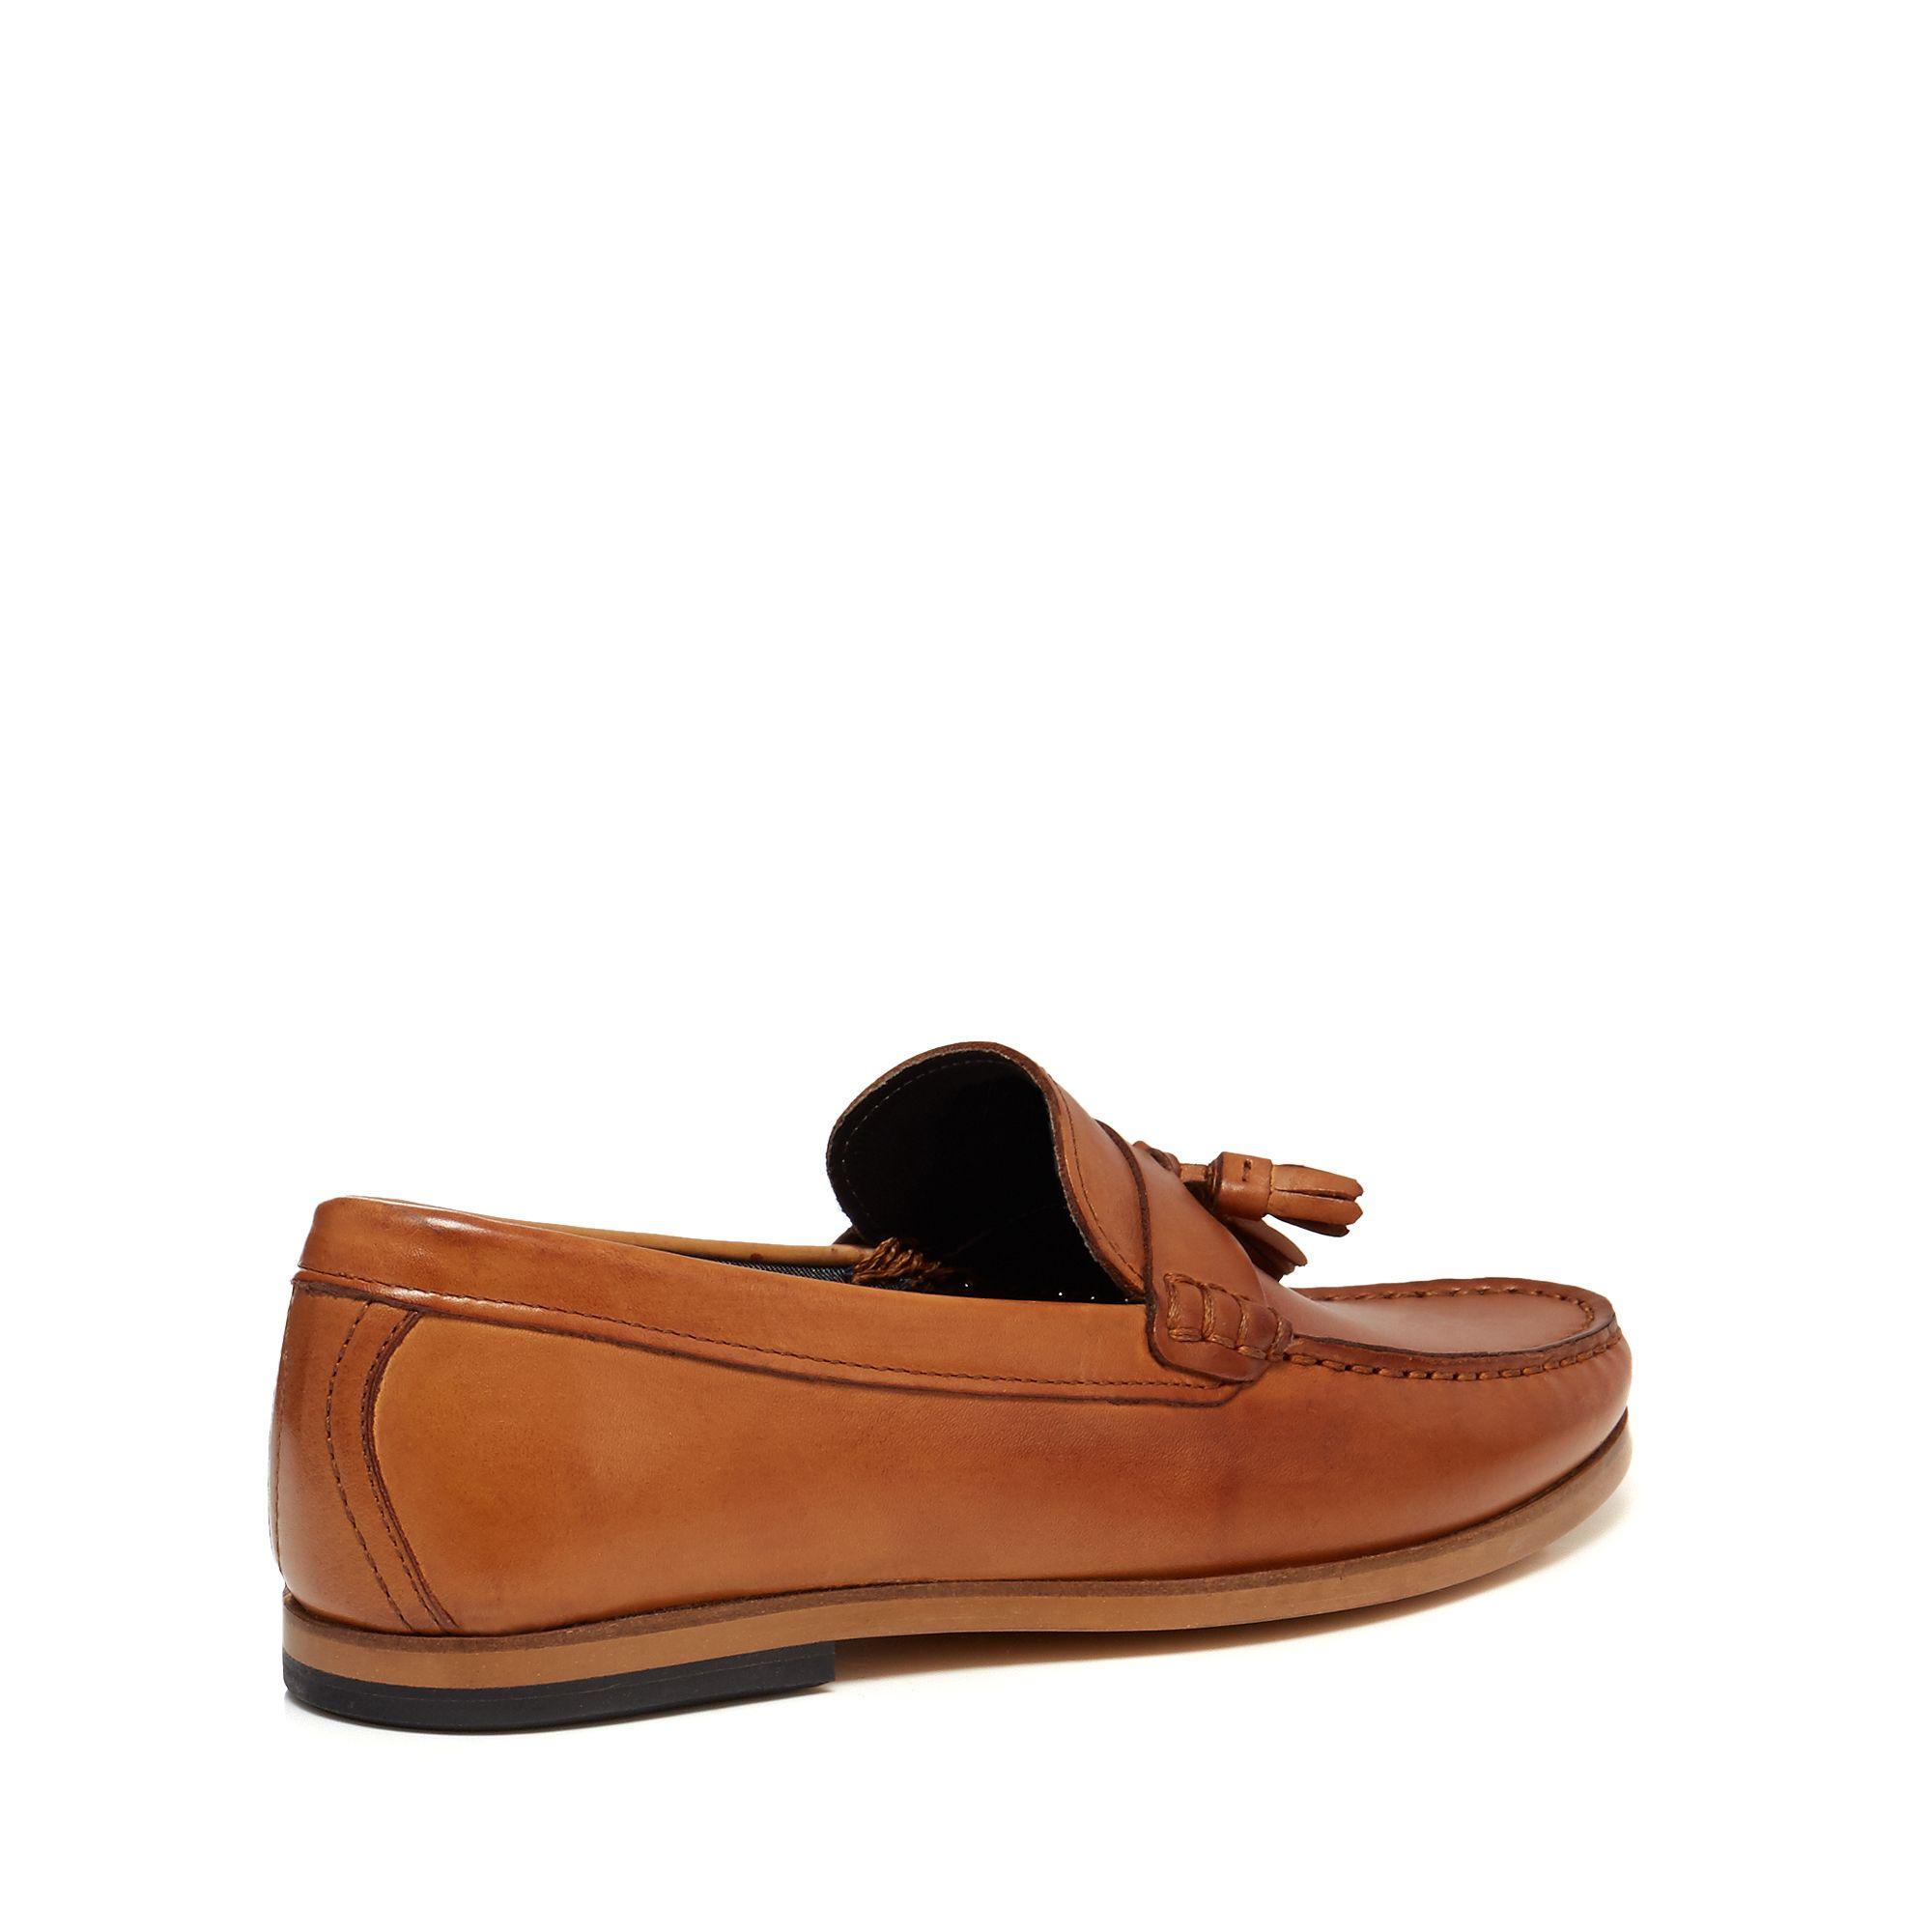 Debenhams Mens Shoes Tan